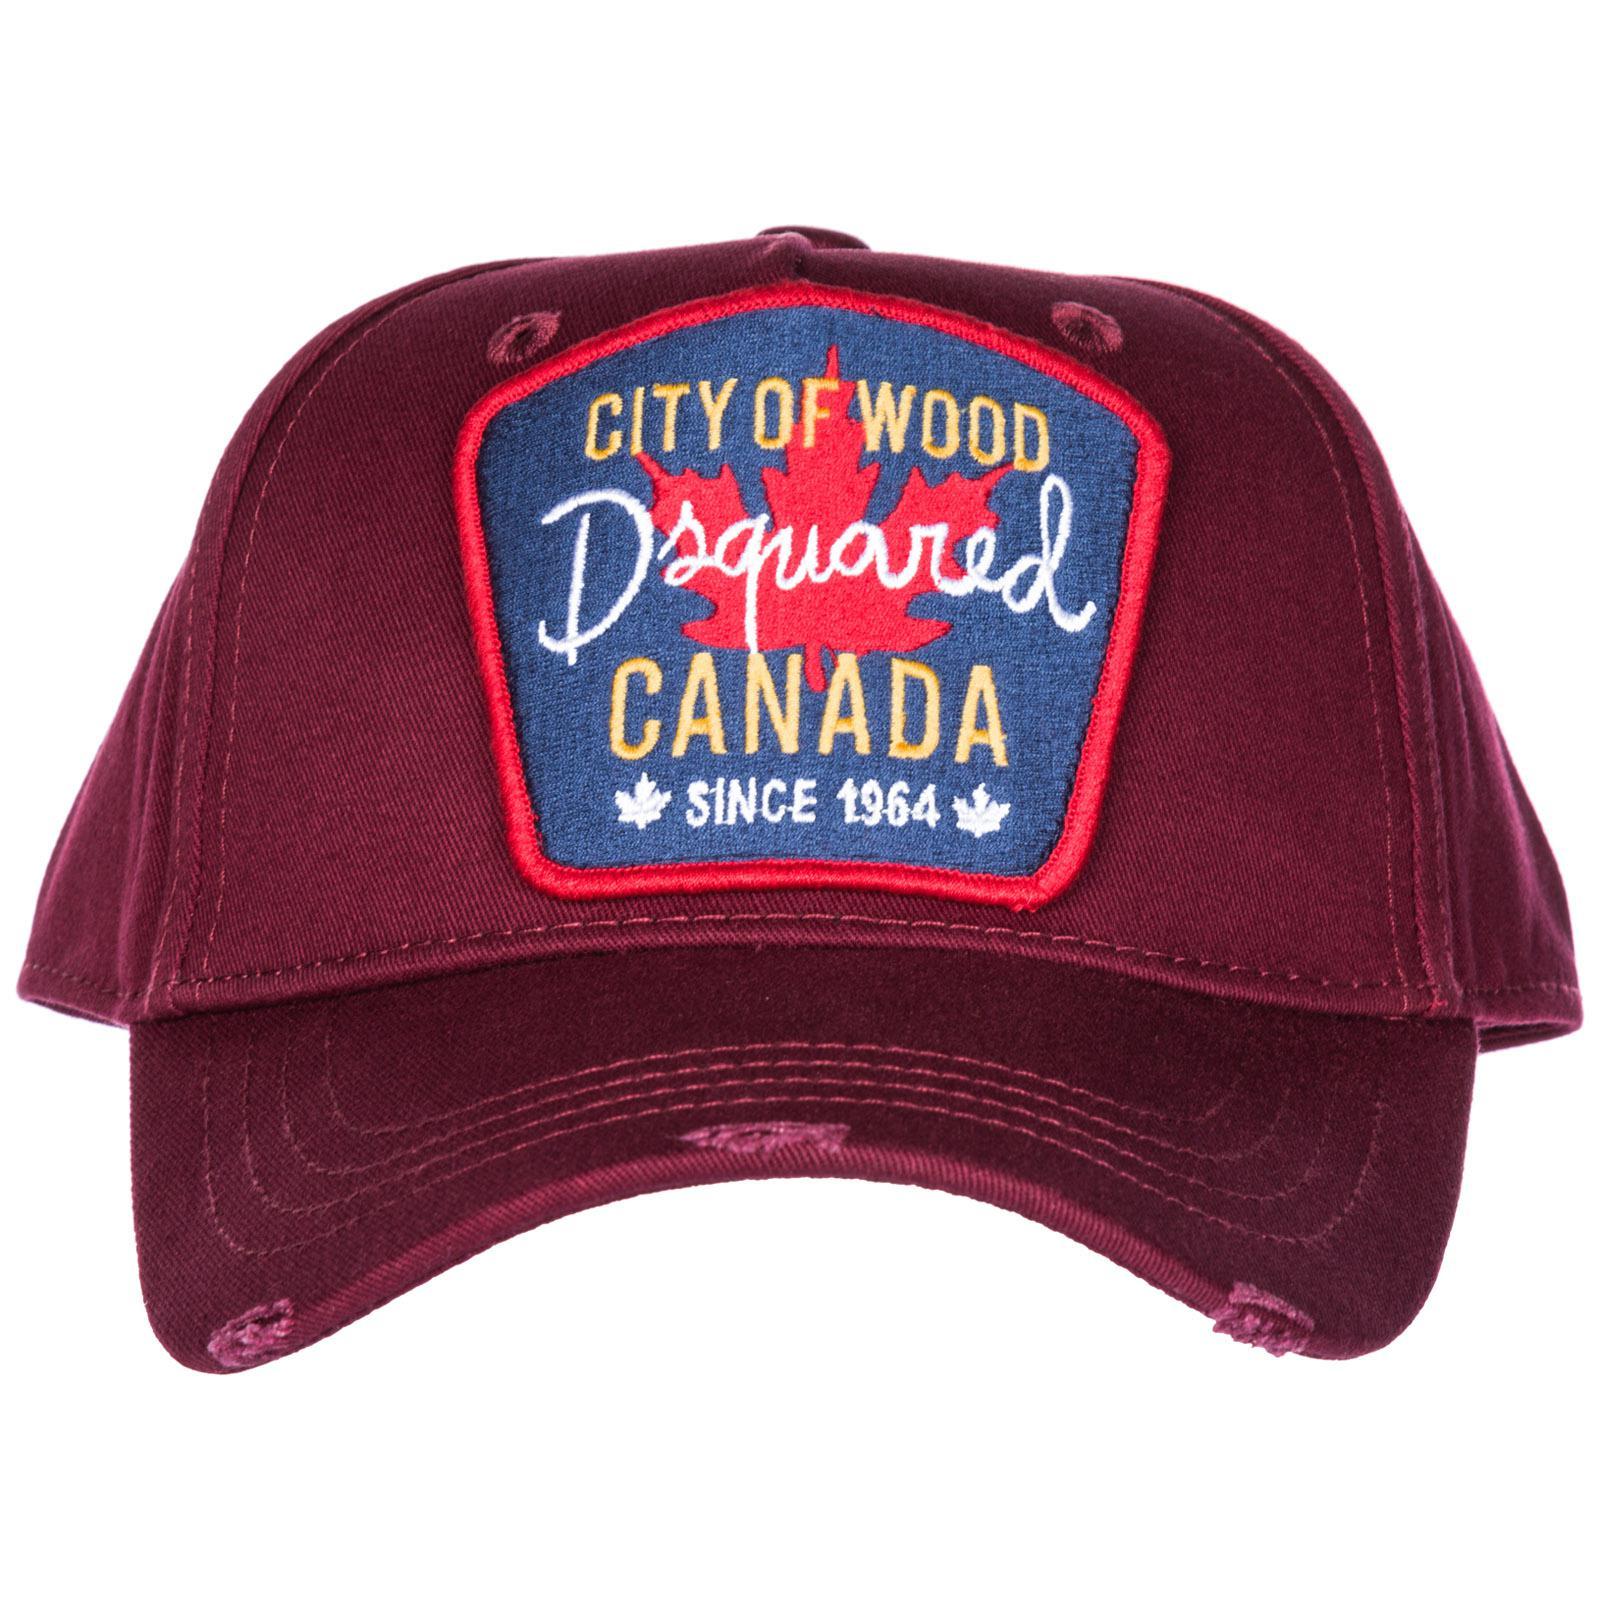 Lyst - Dsquared² Adjustable Cotton Hat Baseball Cap Citi Of Wood in ... 6780b598b81c